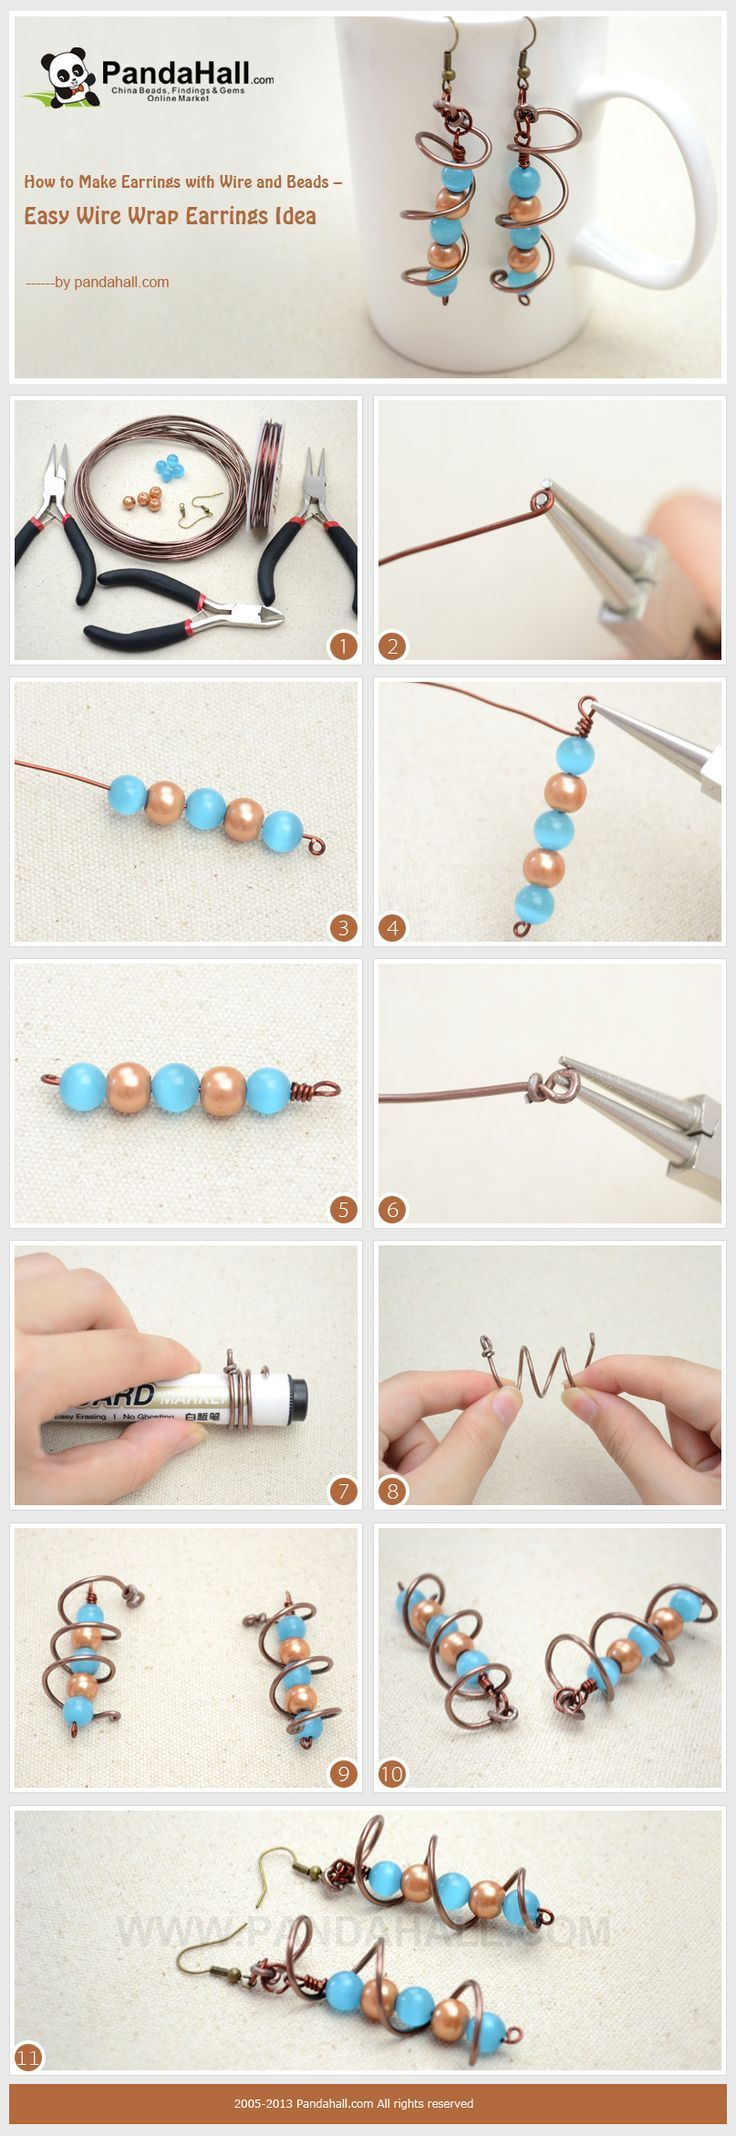 42 best Other wire ideas images on Pinterest | Tutorials, Bracelet ...